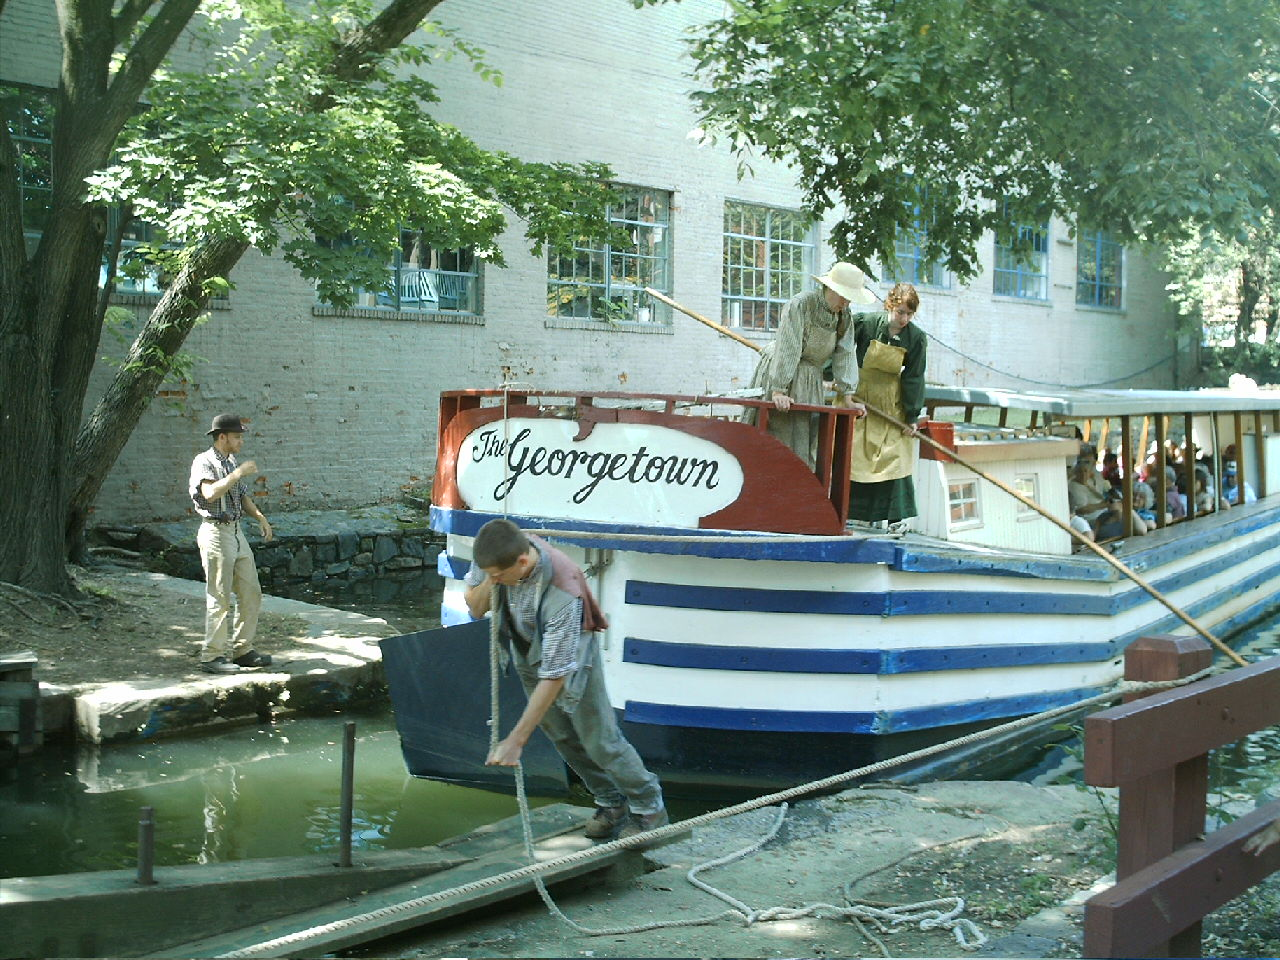 [C&O+-+renovated+canal+boat+entering+lock.JPG]